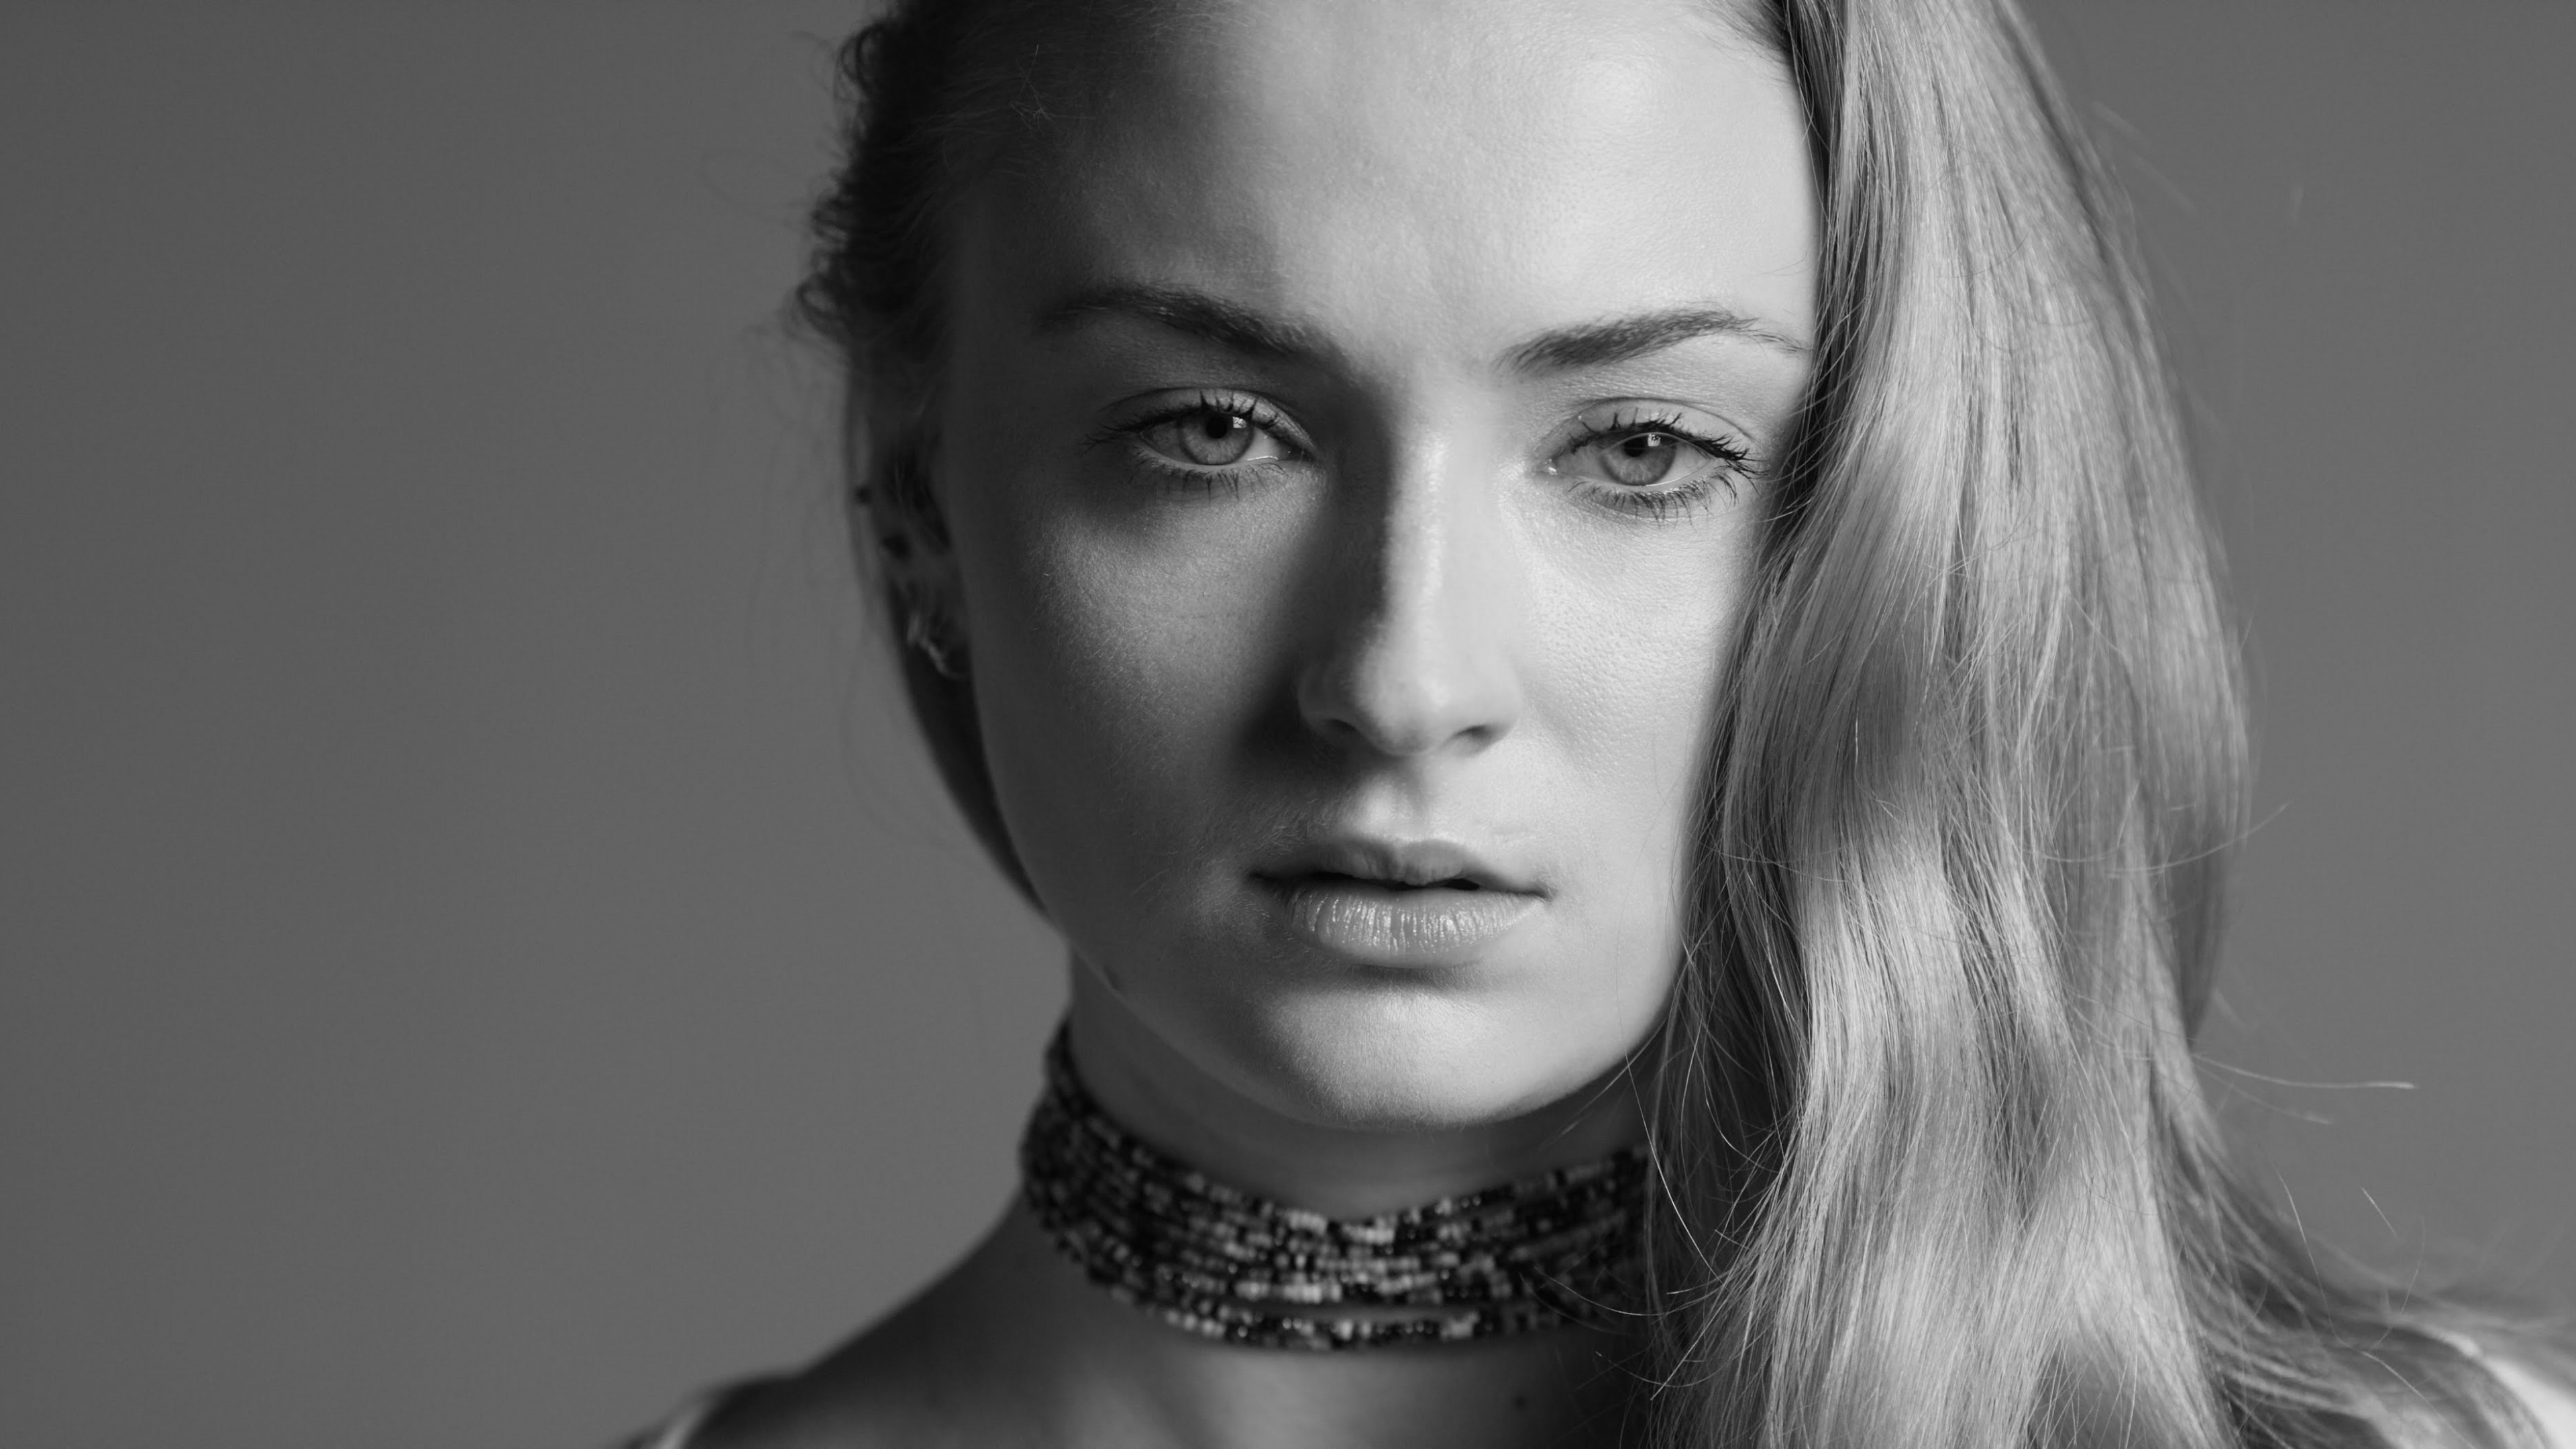 Sophie turner monochrome portrait 4k